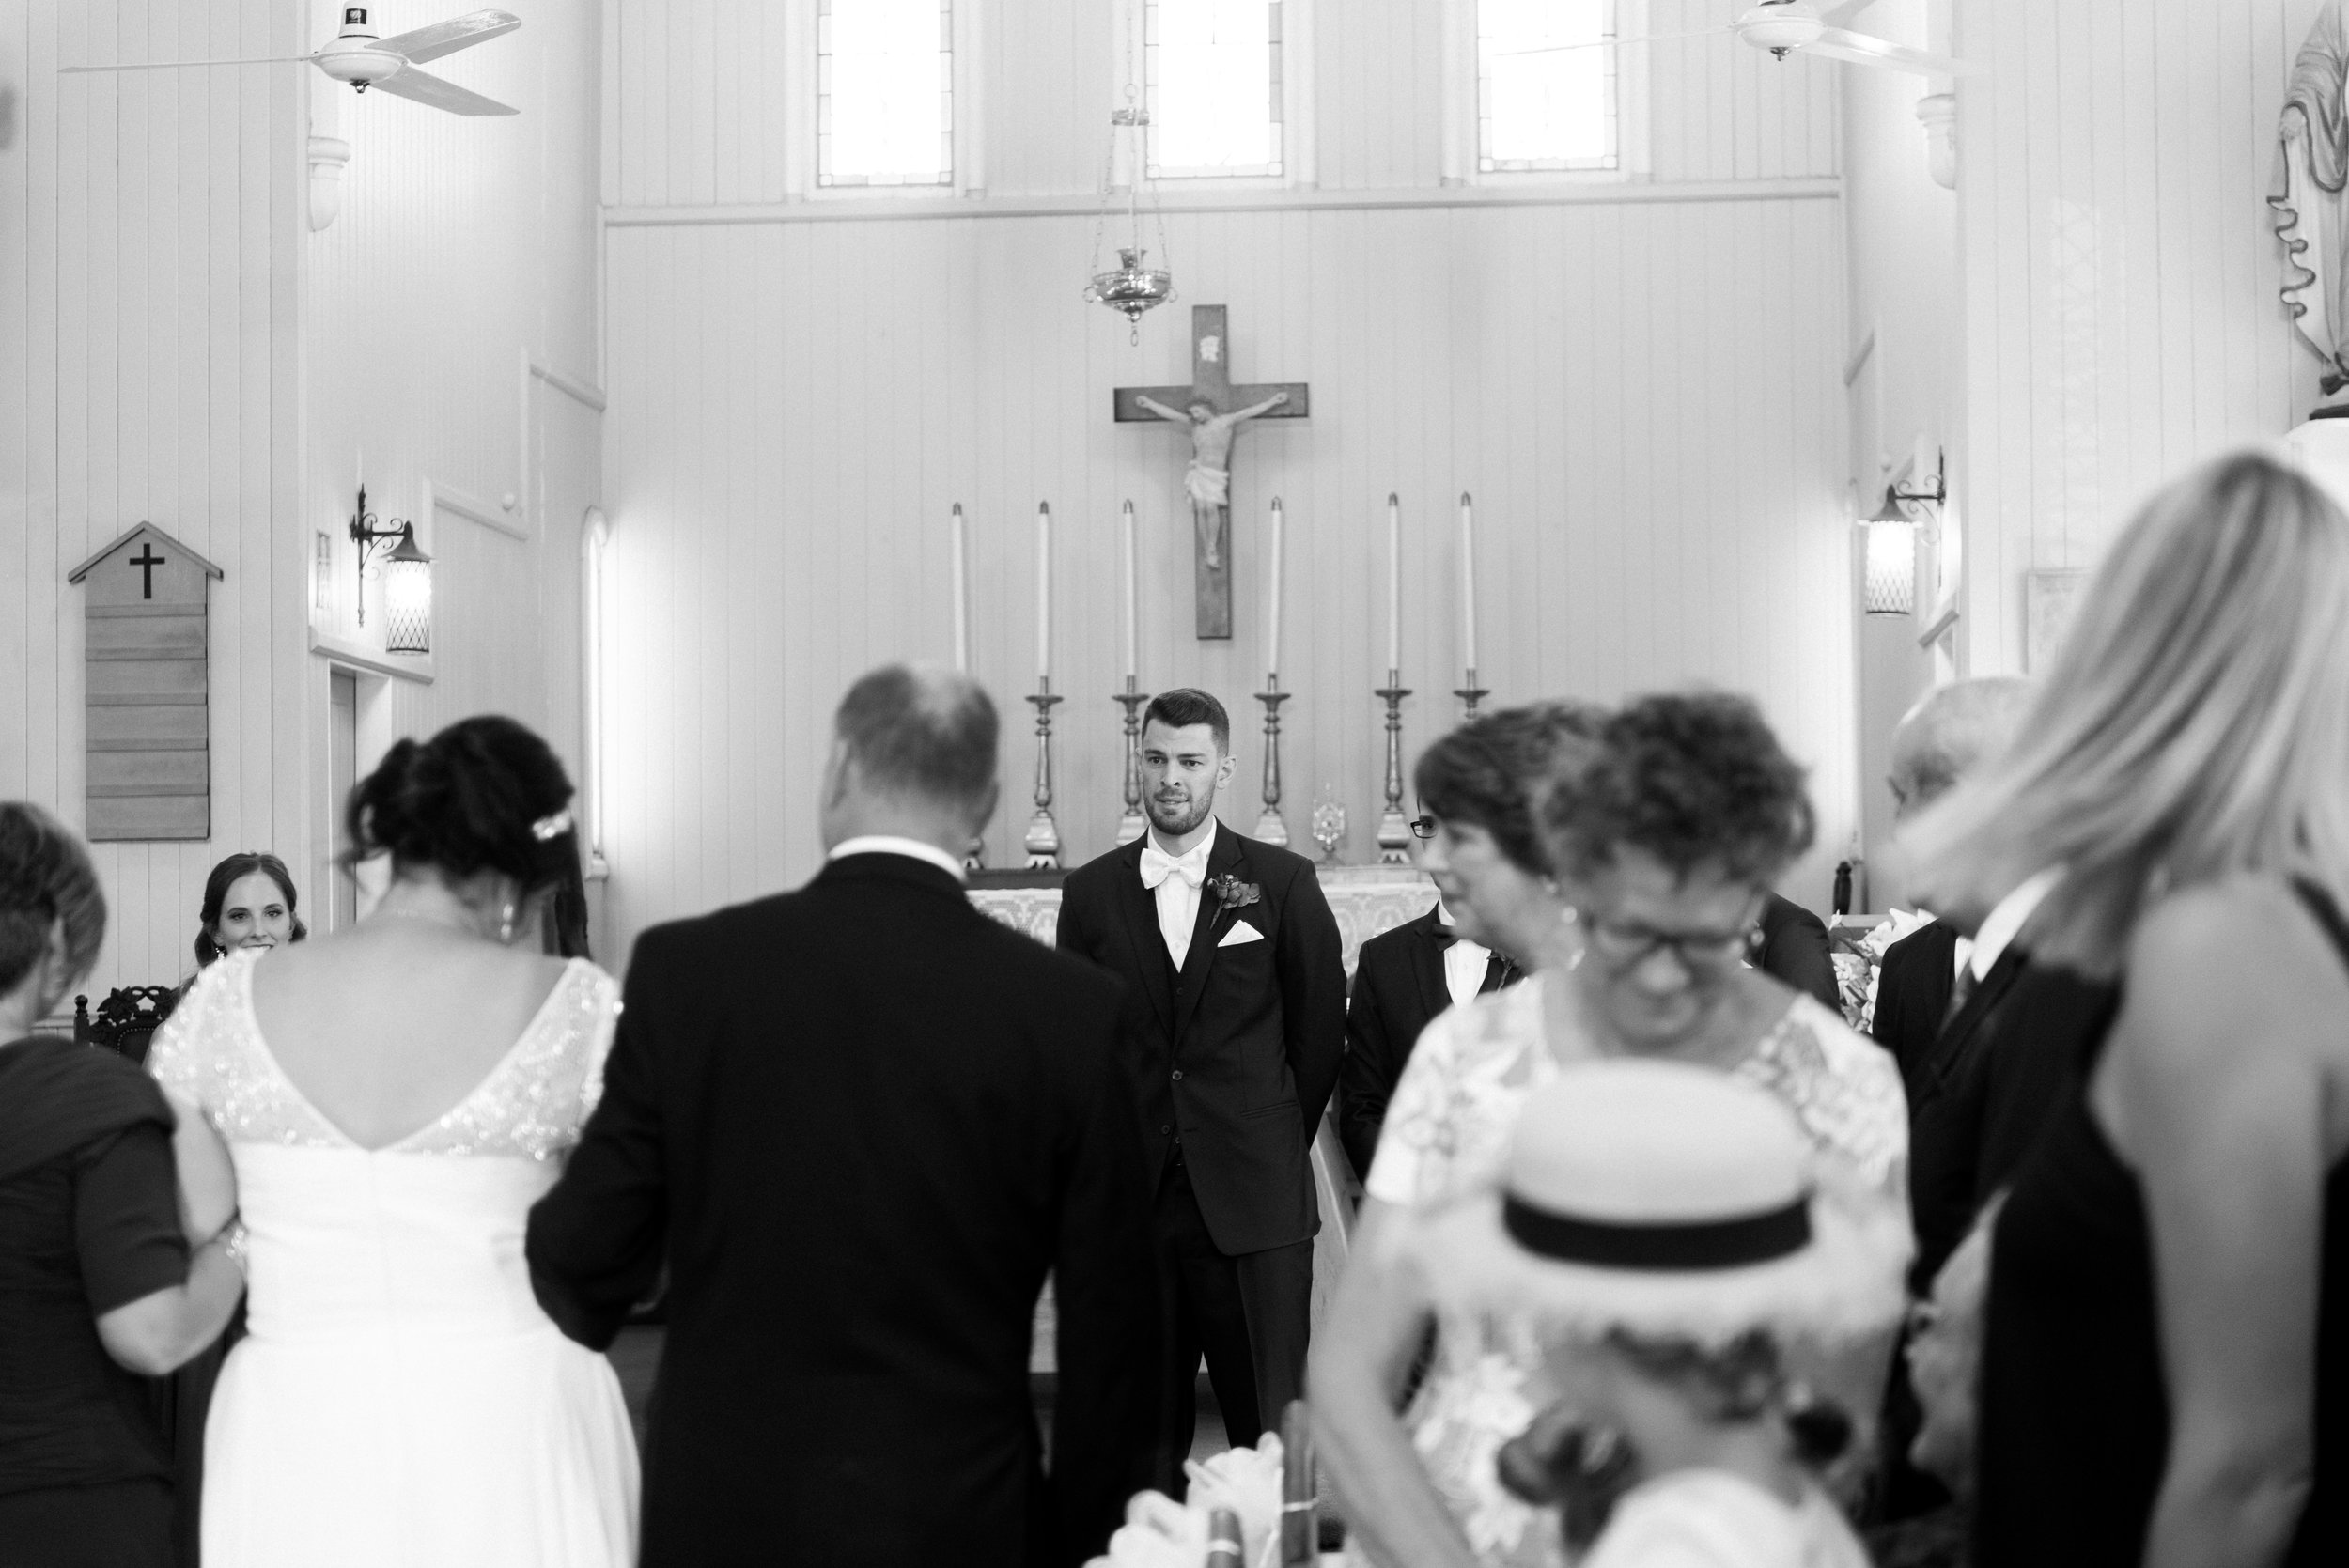 brisbane-city-wedding-photography-film-light-loft-westend-1-3.jpg